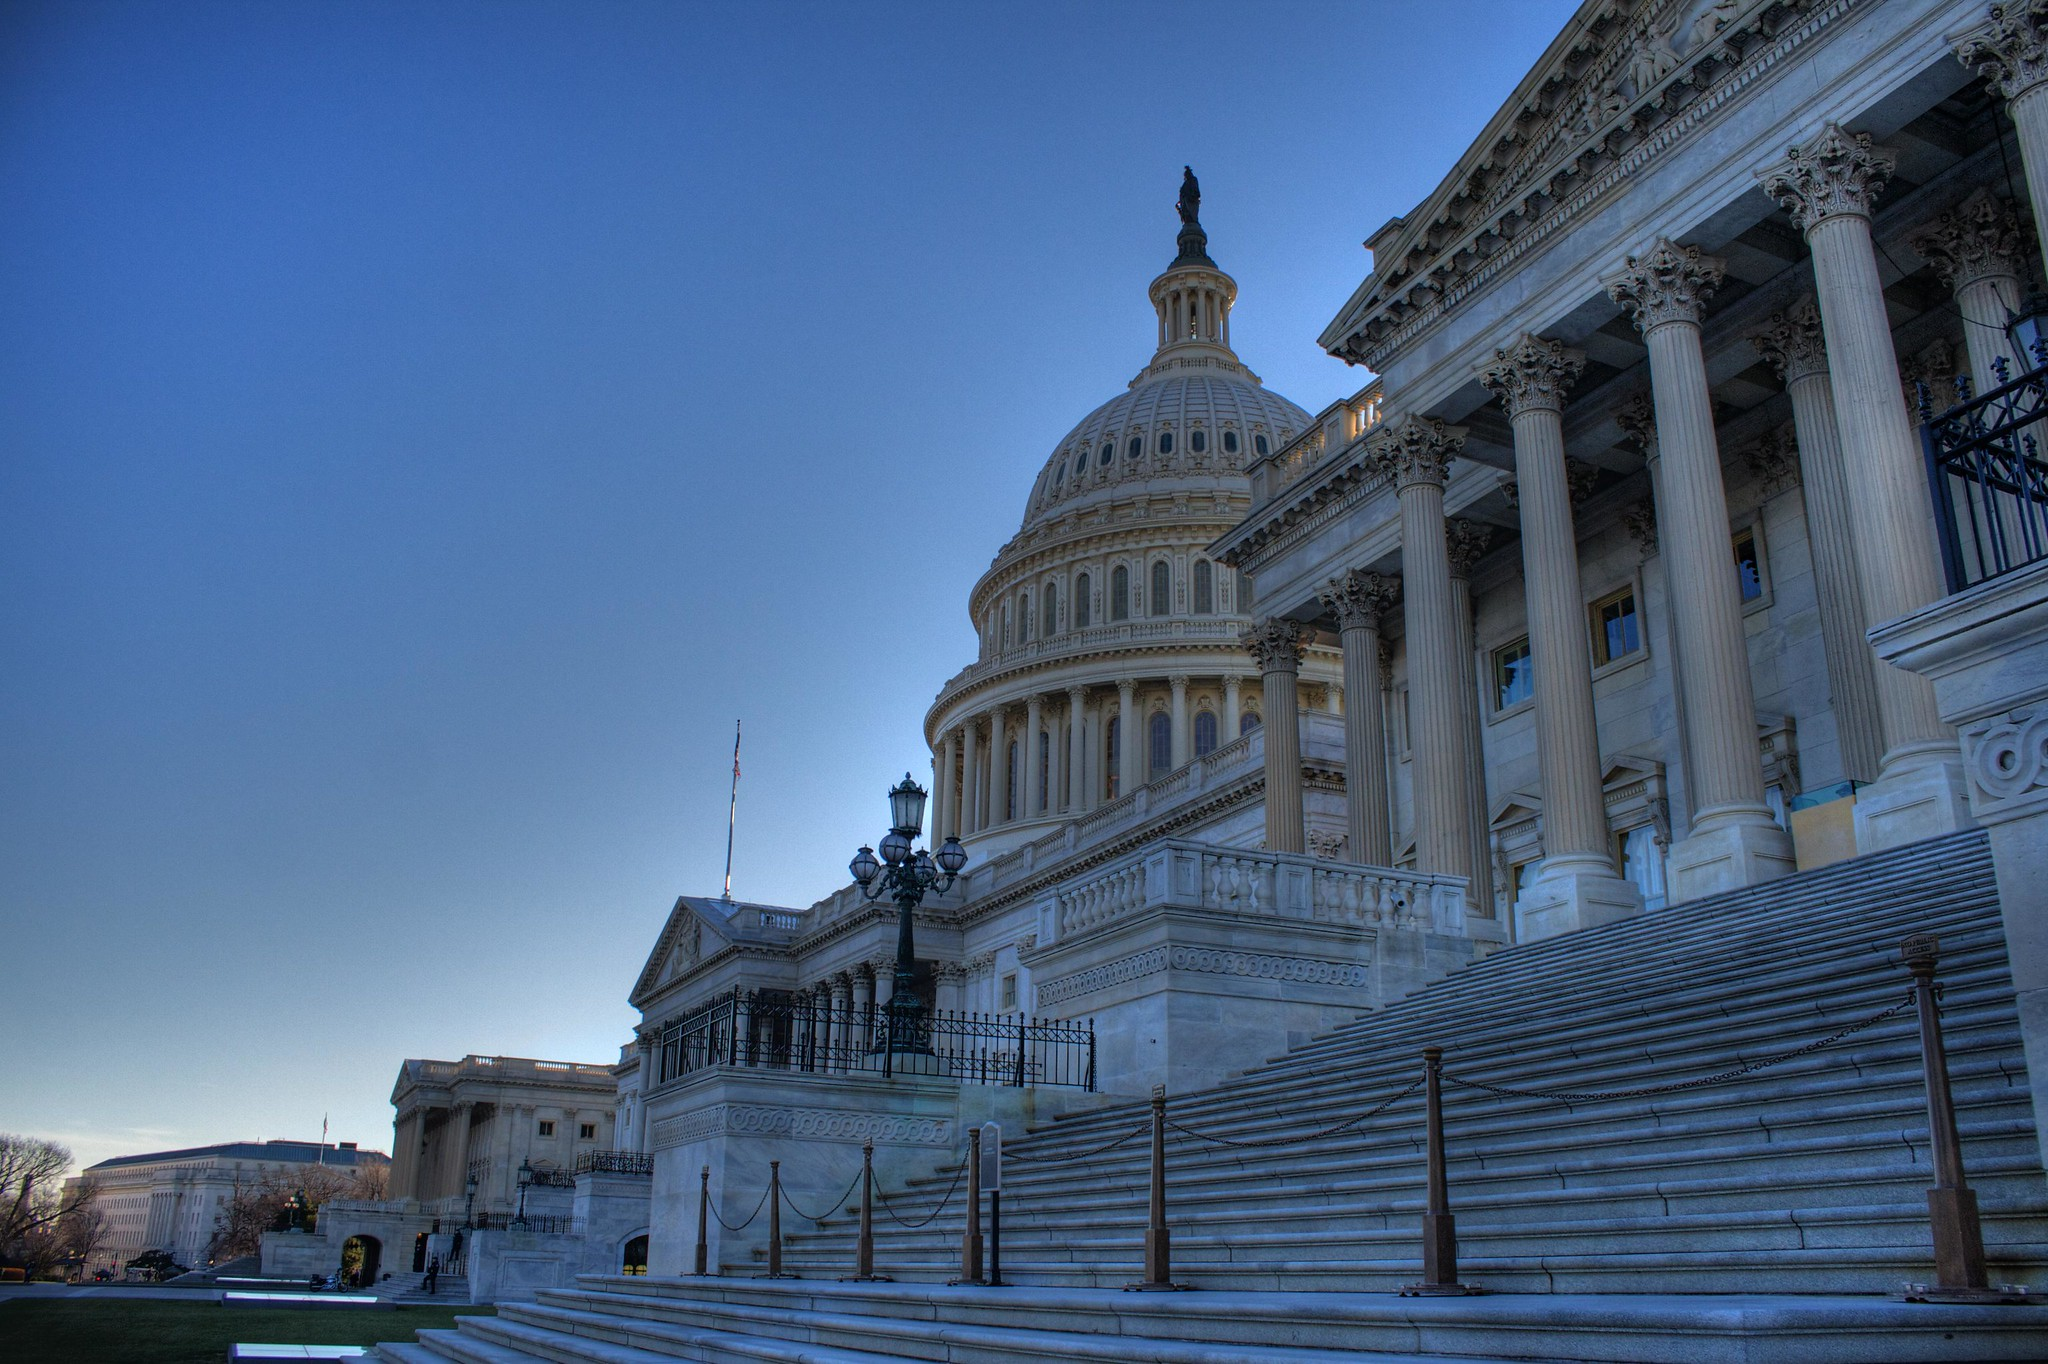 United States Capitol, Washington DC (December 2013) [OC] [2048x1364]